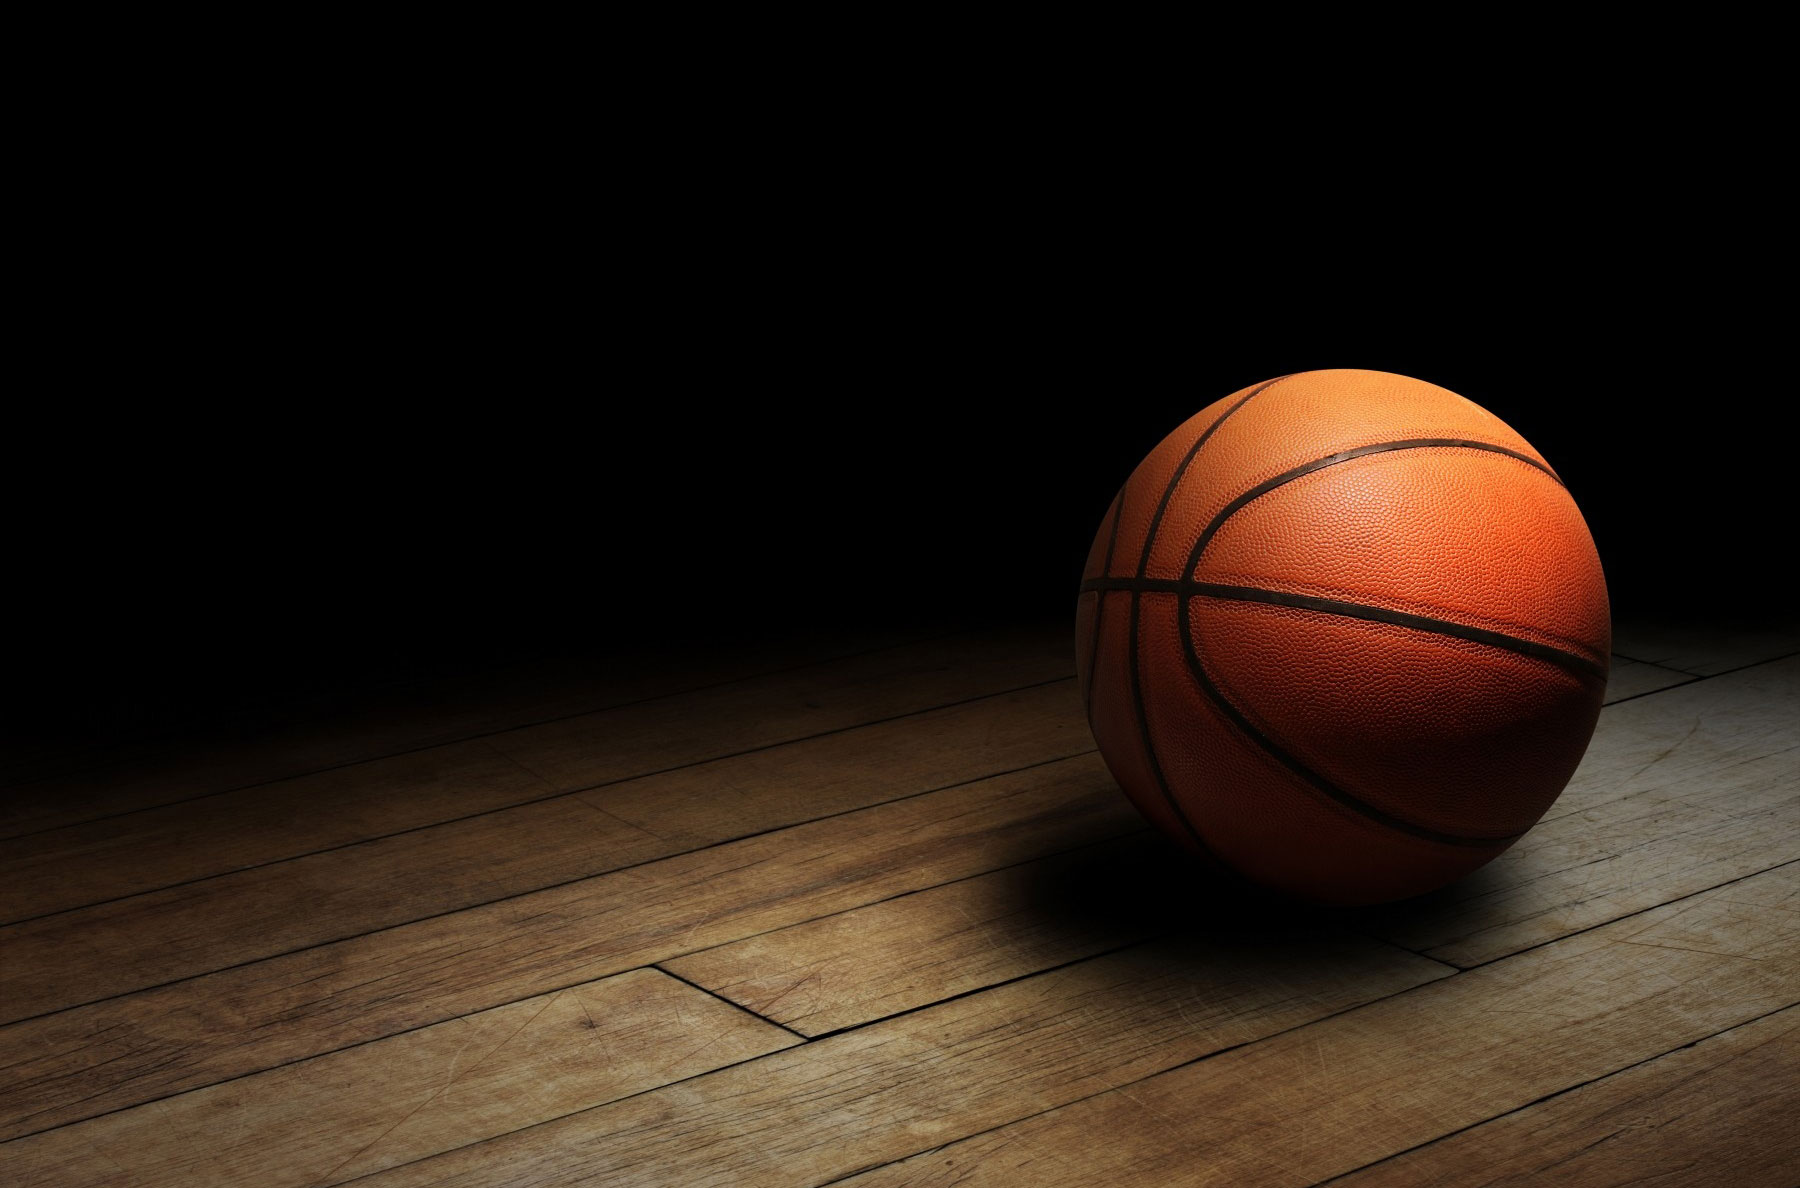 Basketball-on-Court